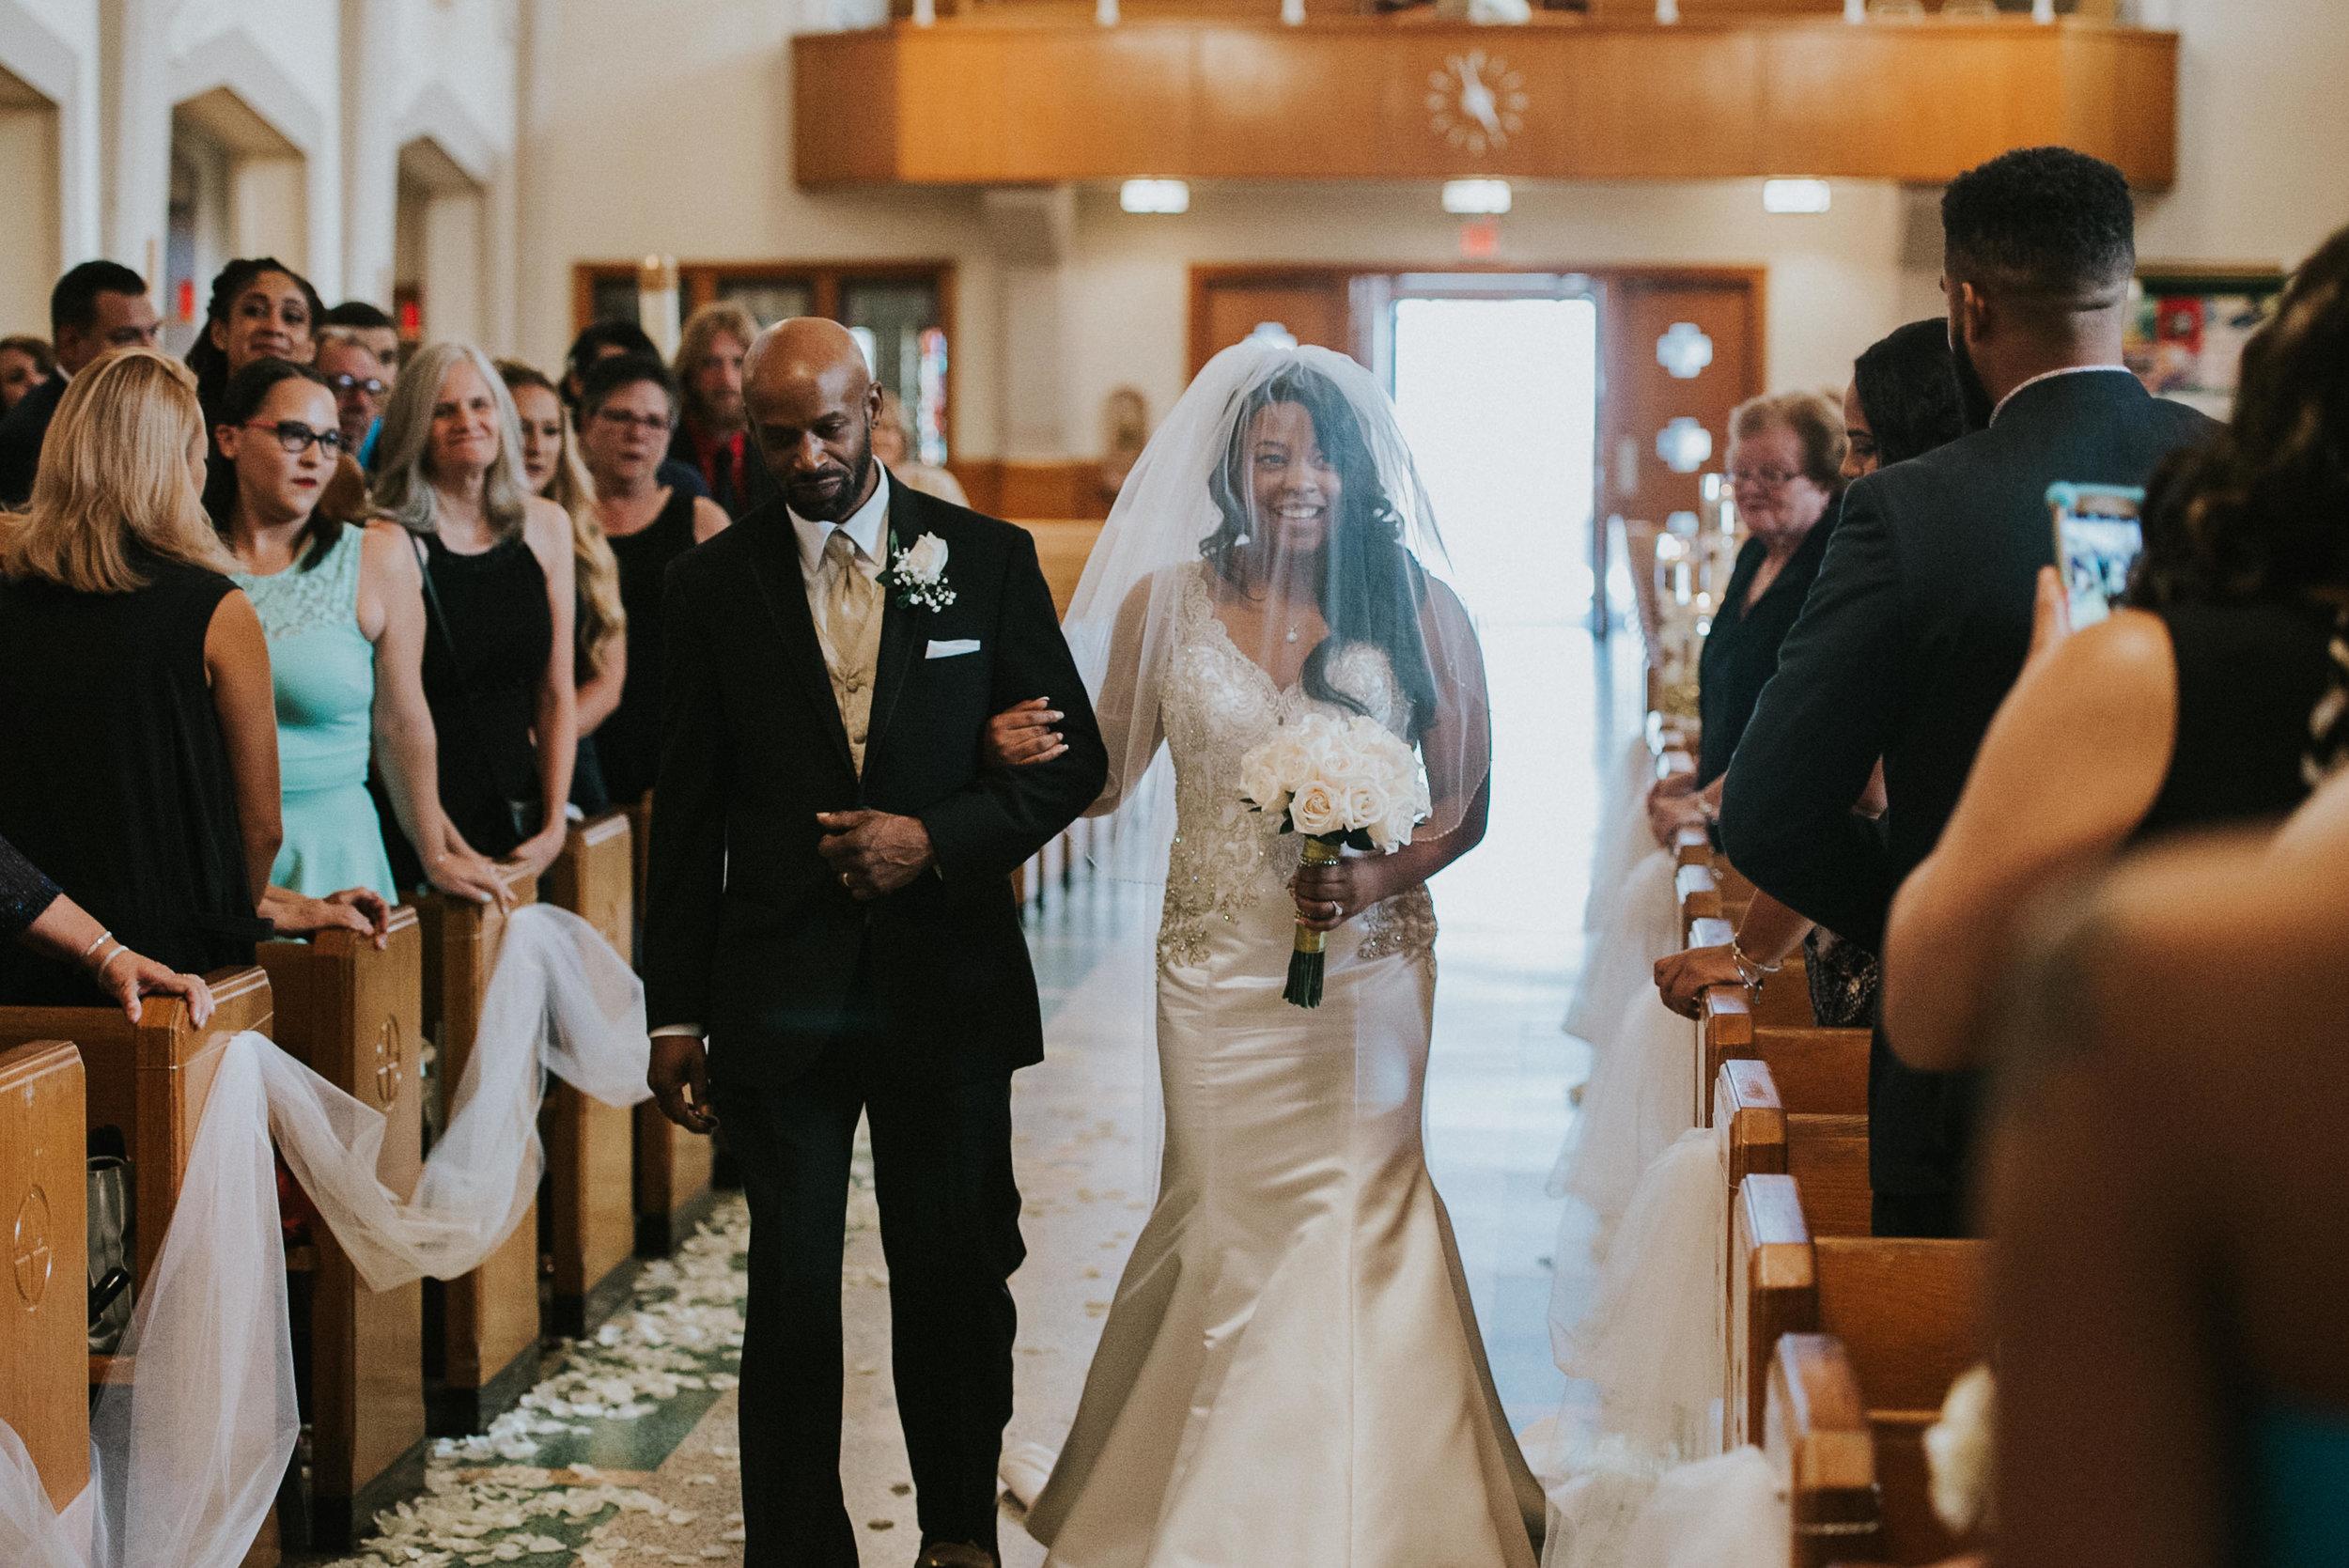 Tiana-and-Danny-Wedding-361.jpg